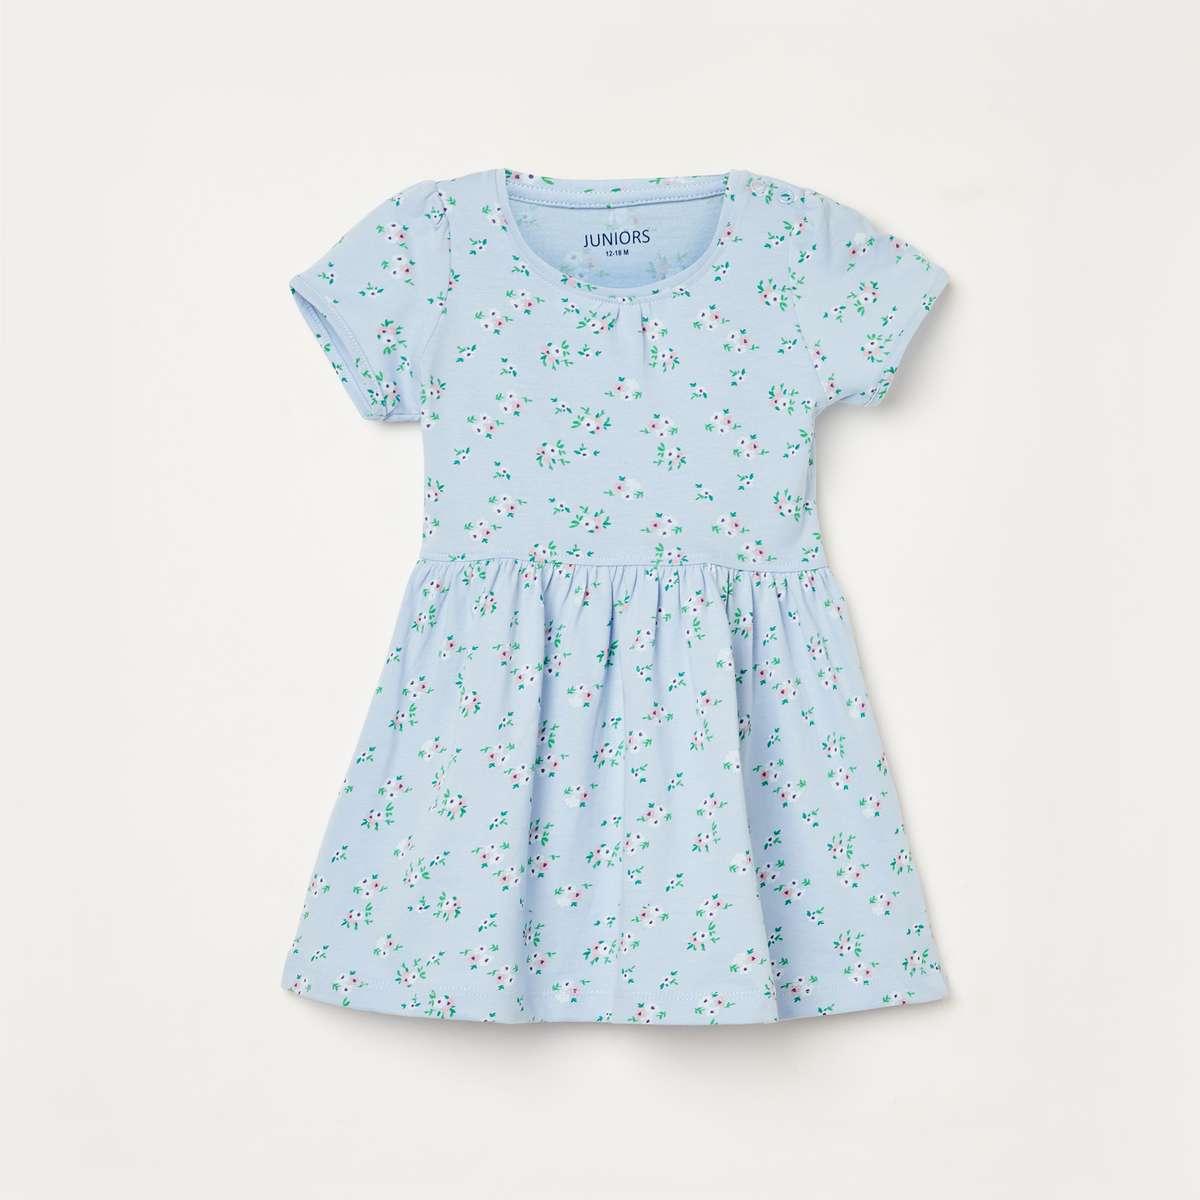 4.JUNIORS Girls Printed A-line Dress